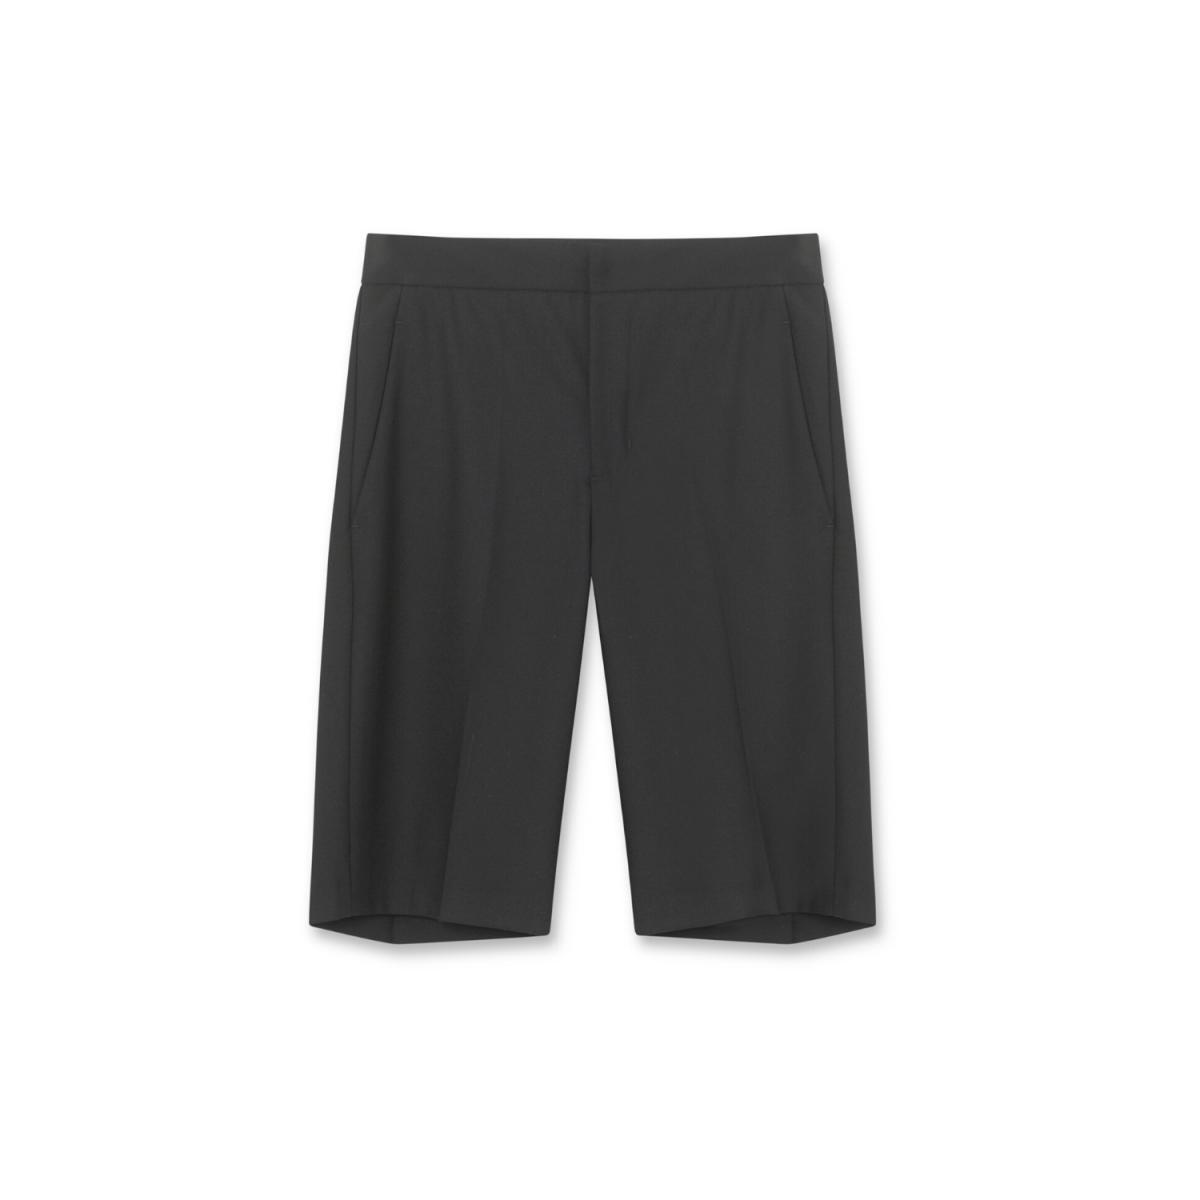 agnes shorts - black